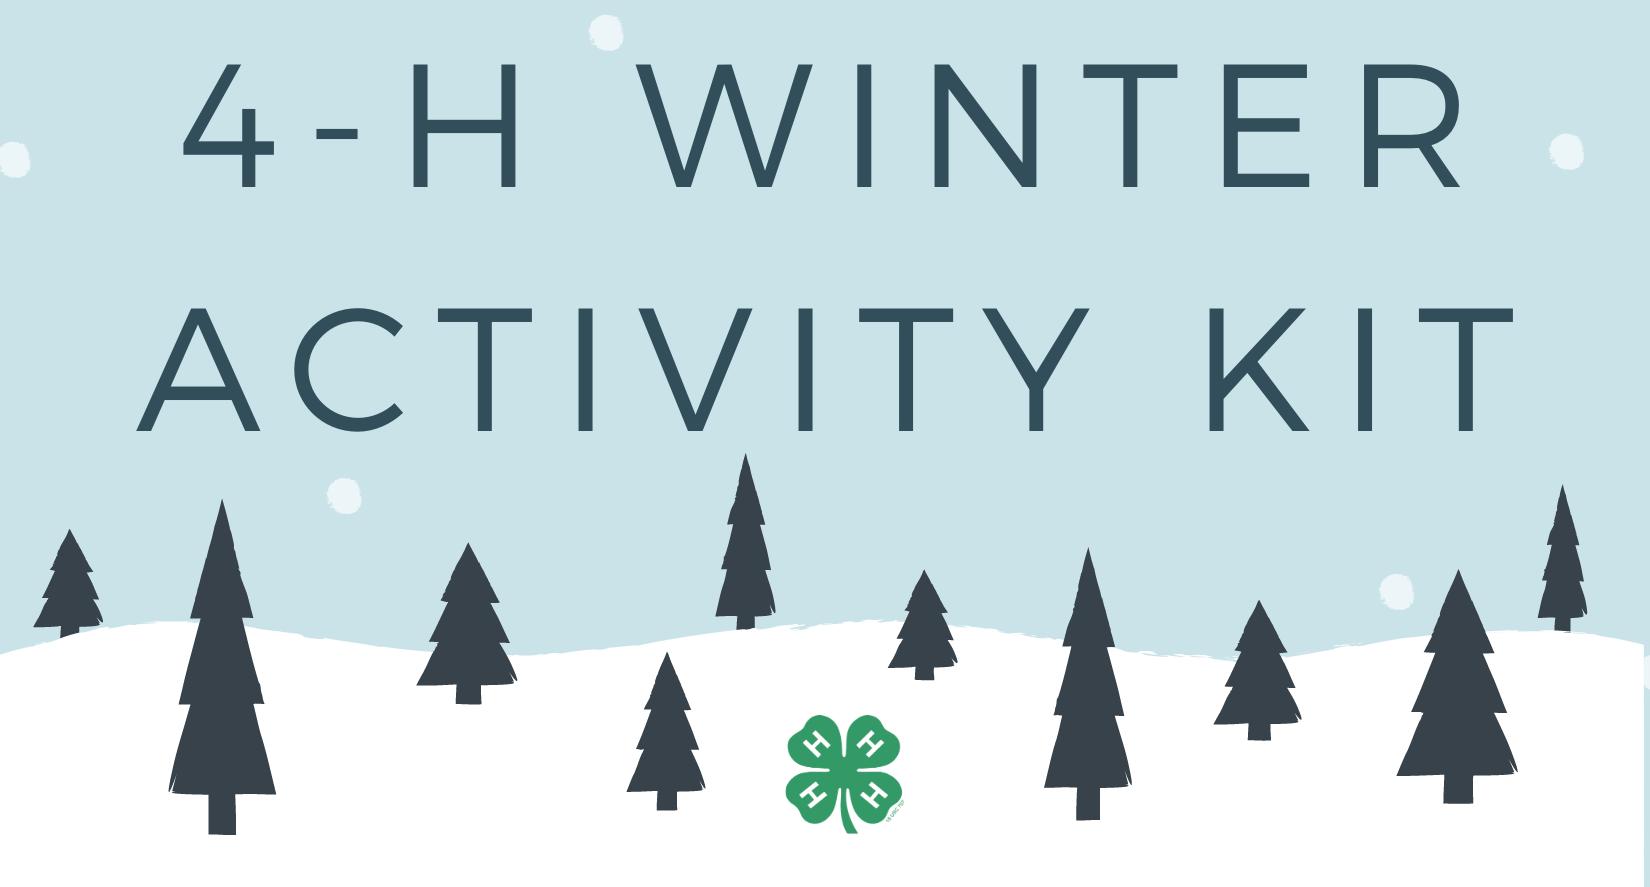 4-H Winter Activity Kit